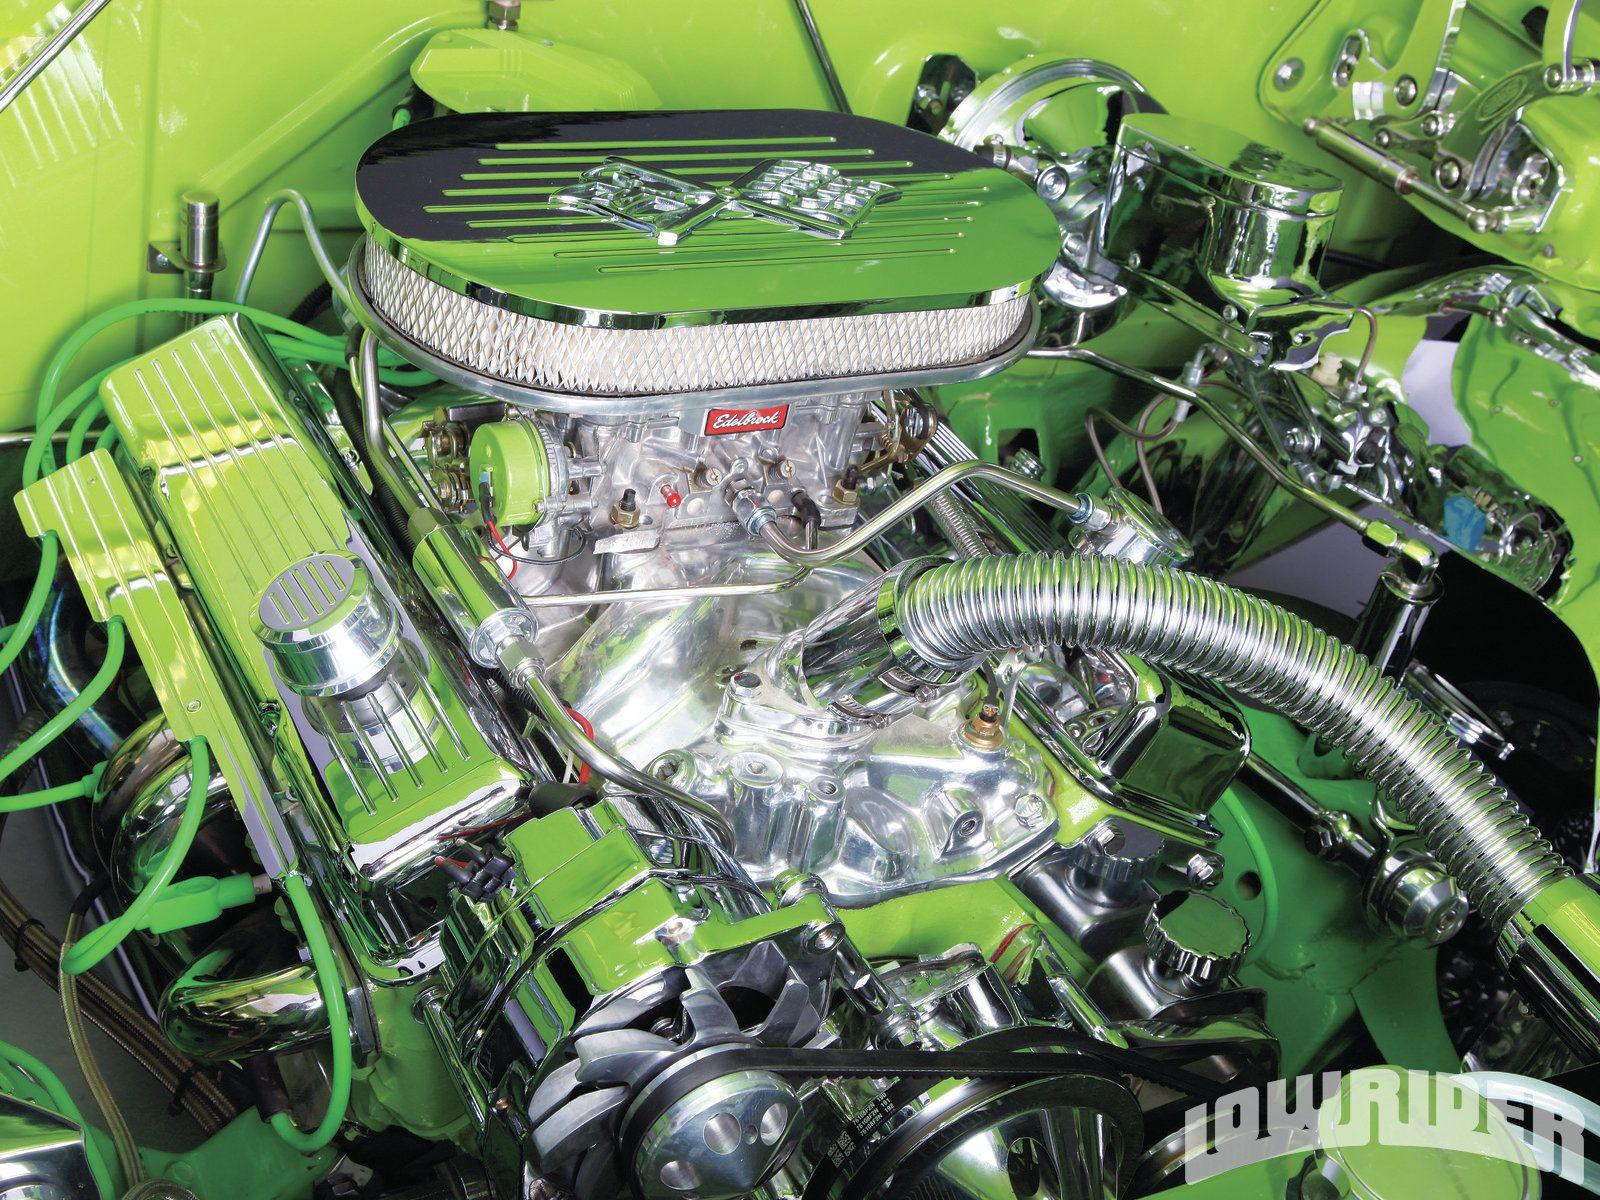 blue spark plug wires custom engines - Google Search | Car Engines ...